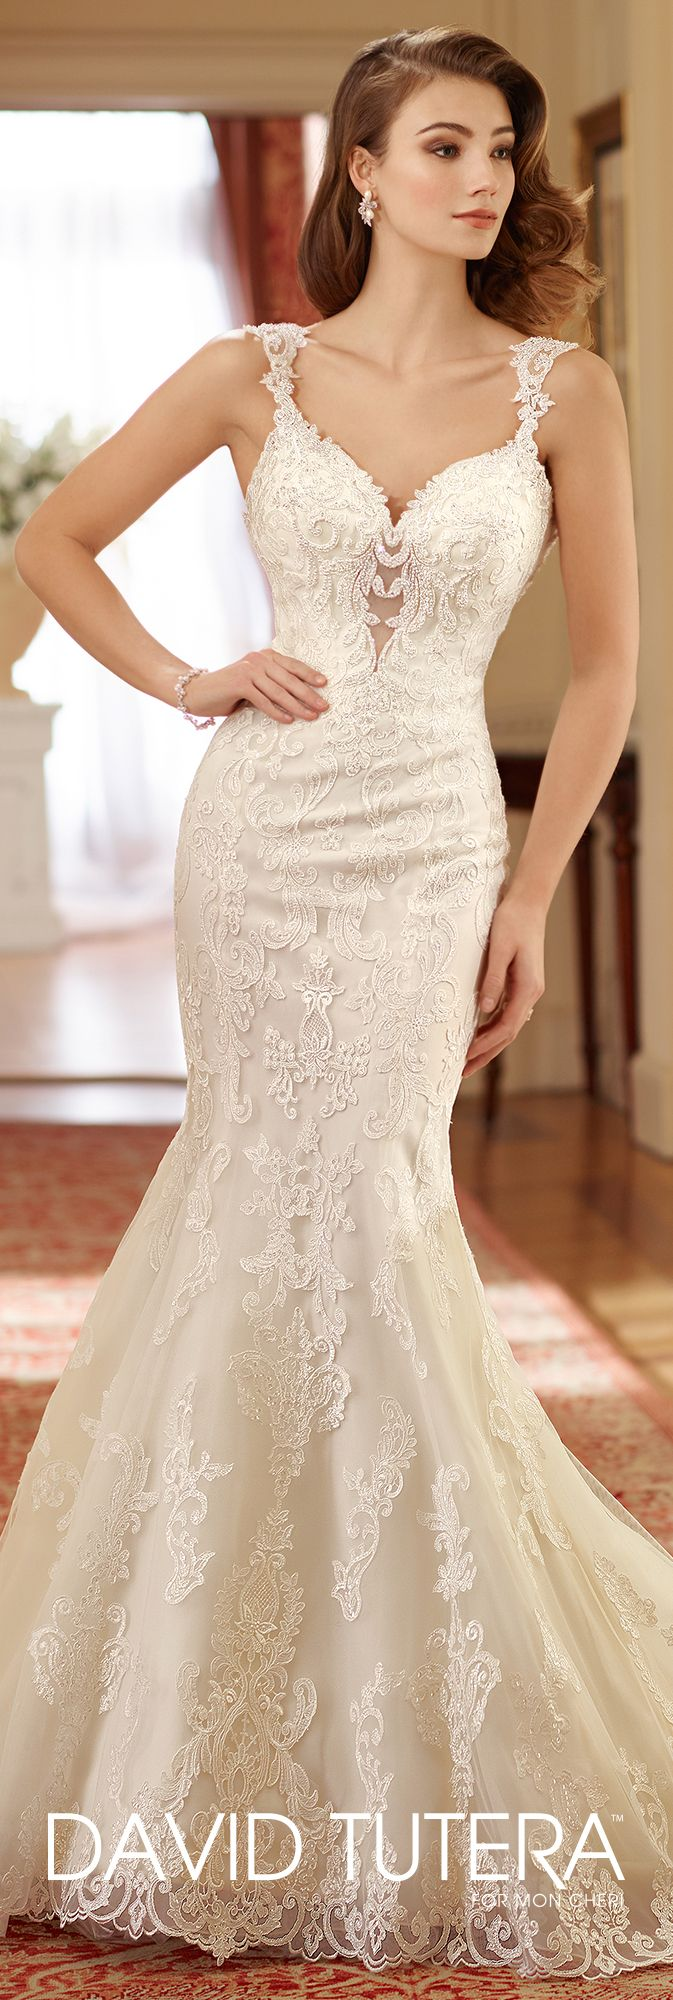 43 best David Tutera images on Pinterest | Short wedding gowns ...